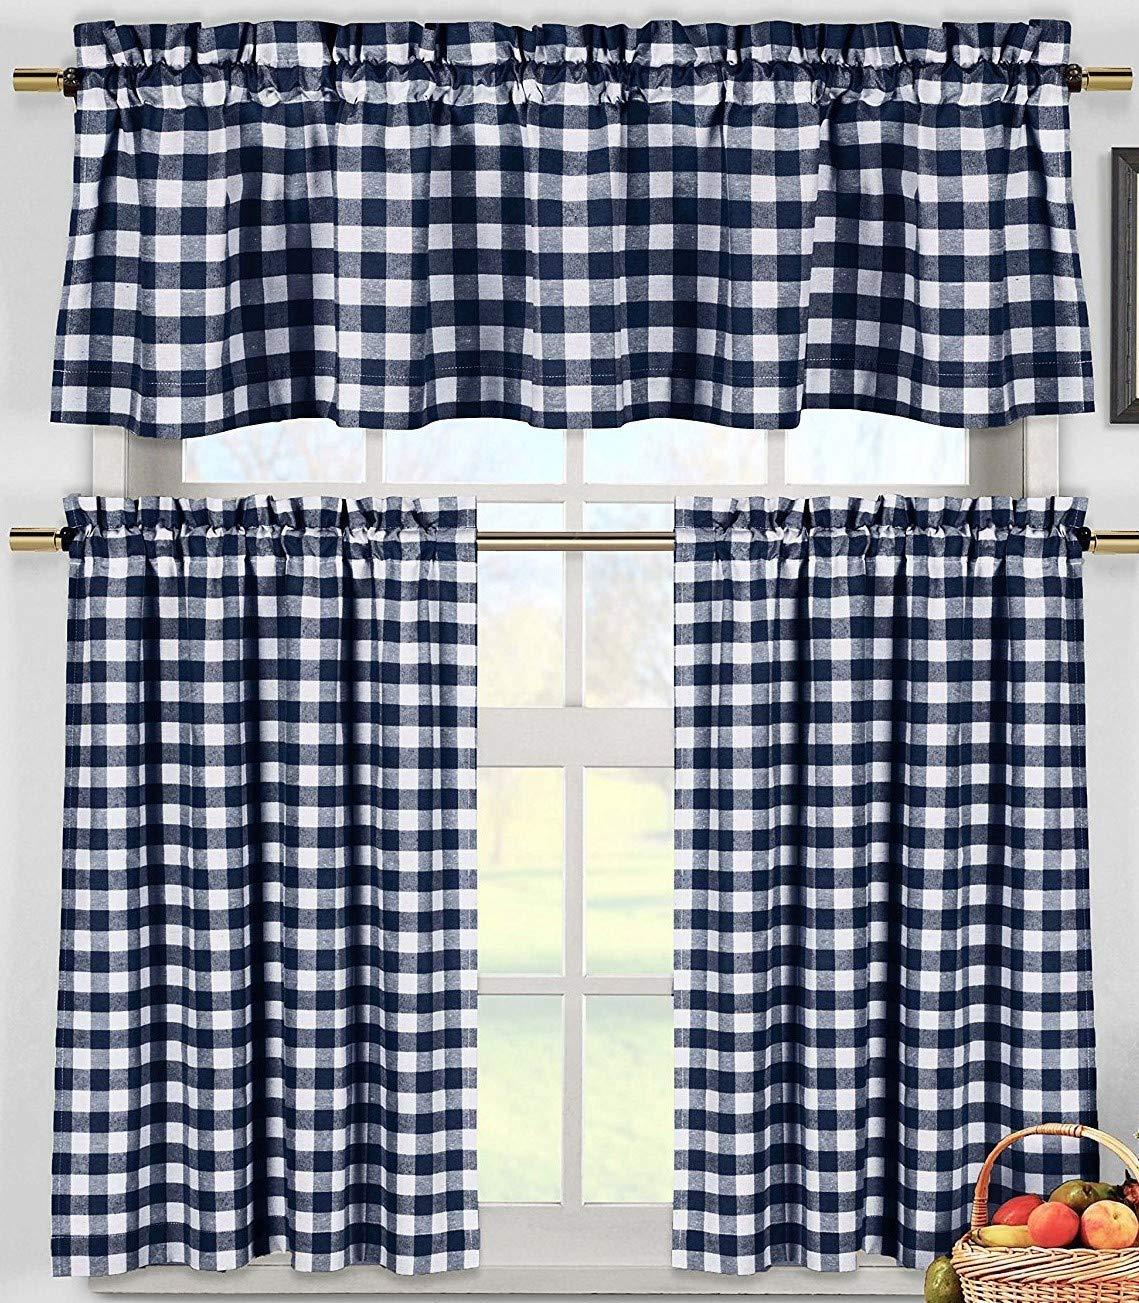 lovemyfabric Poly Cotton Gingham Checkered Plaid Design 3-Piece Kitchen Curtain Valance Window Treatment Set (Navy Blue)